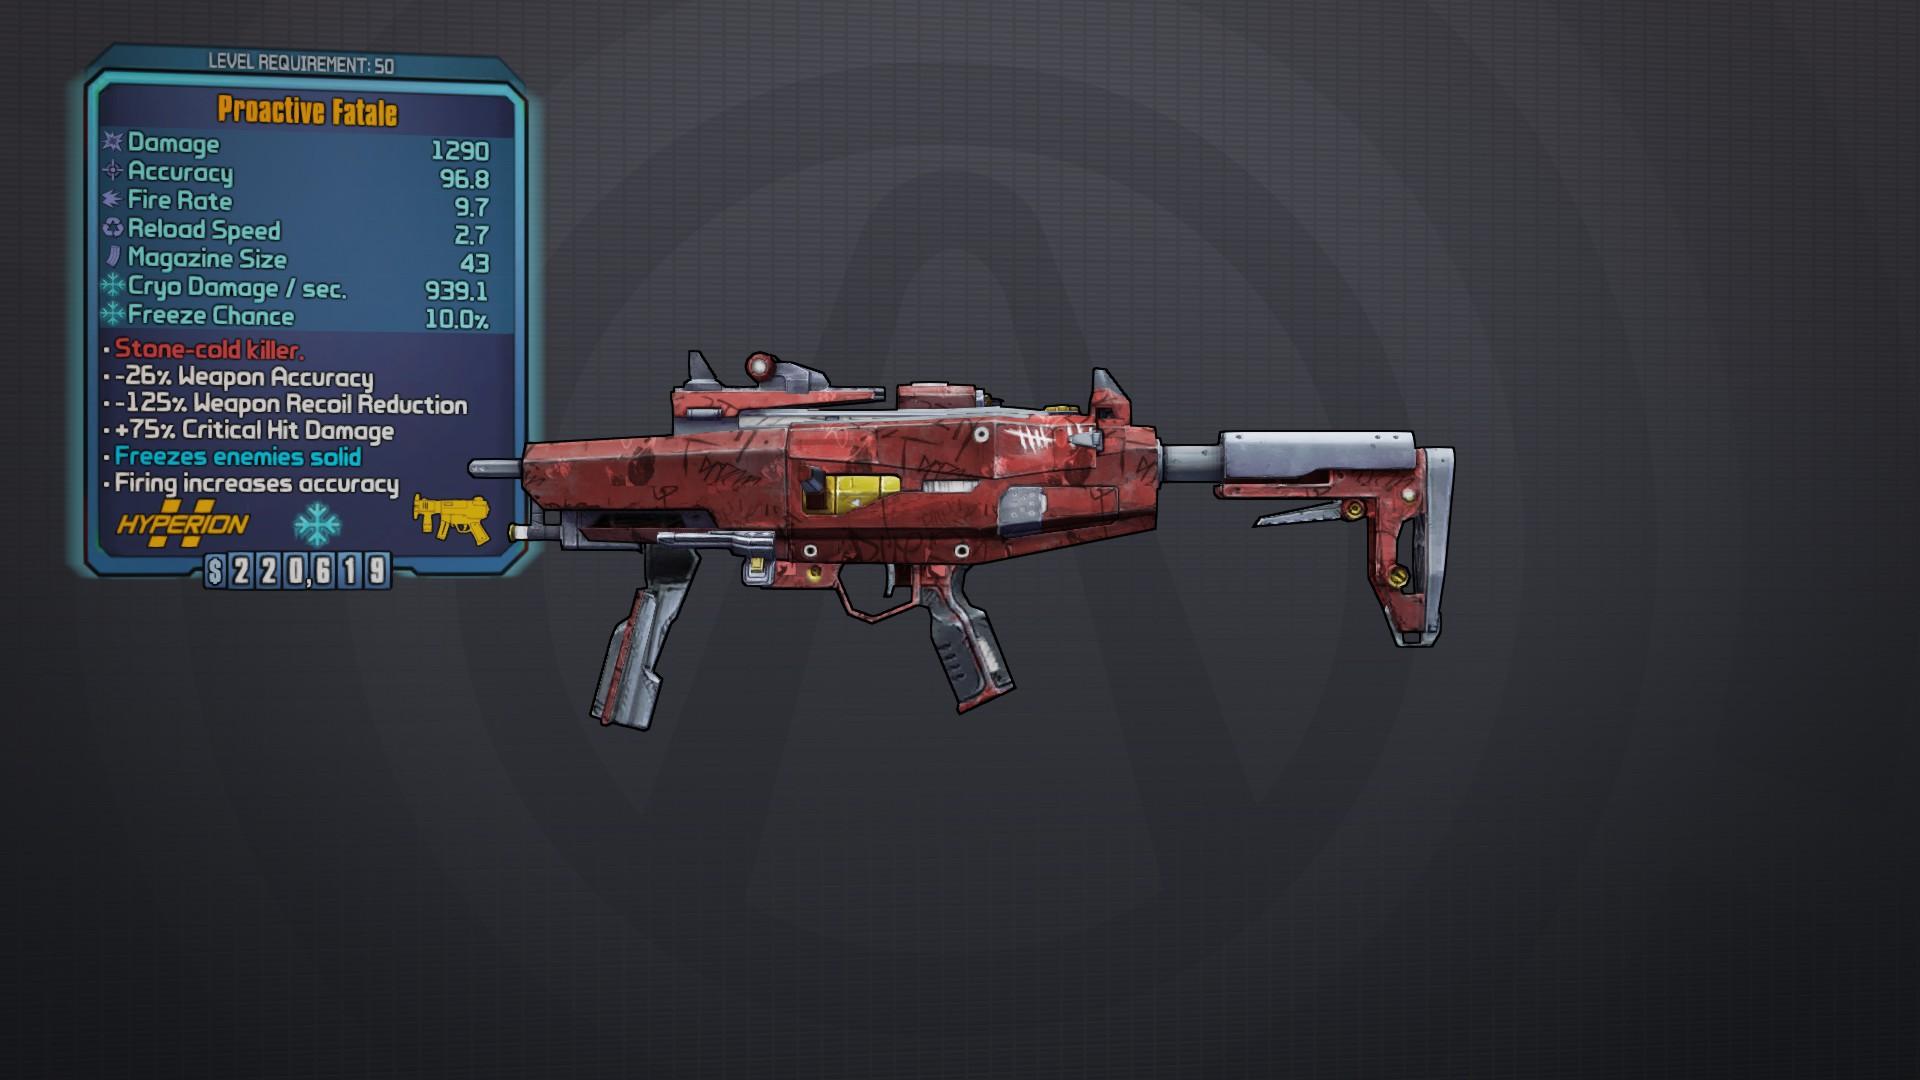 bonetown weapon codes for borderlands